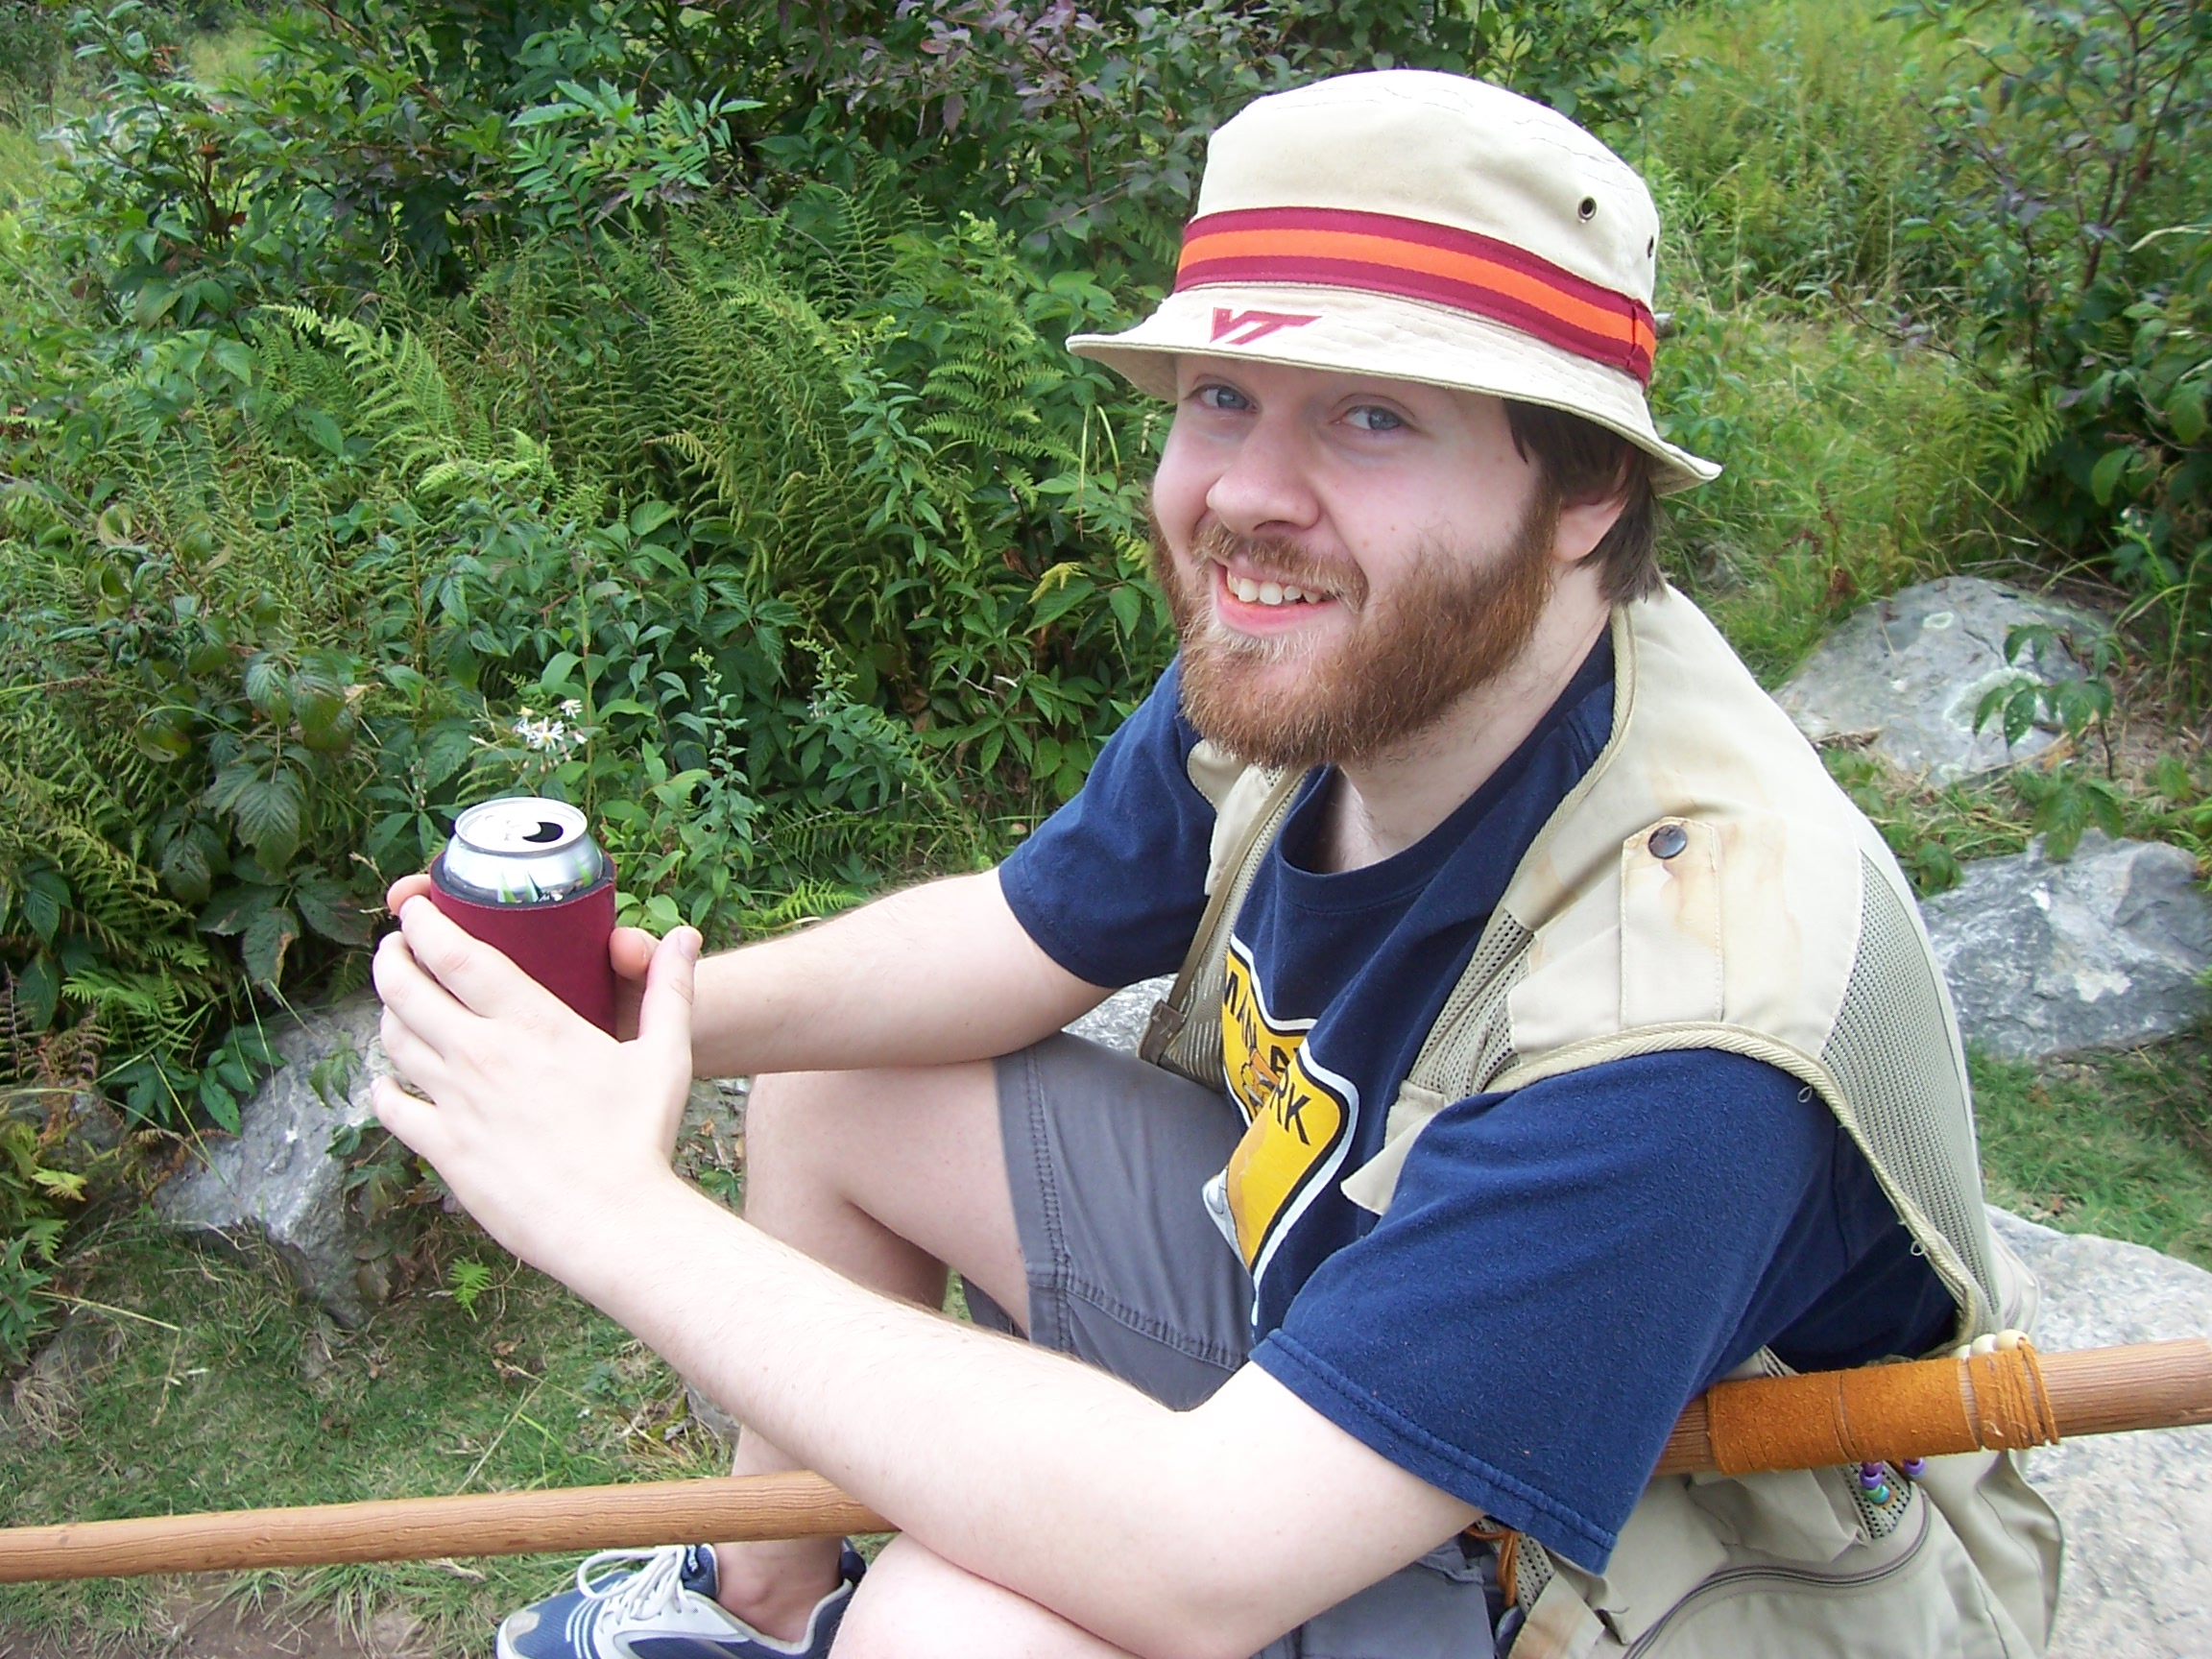 Matt Johnson, Age 29, lives independently